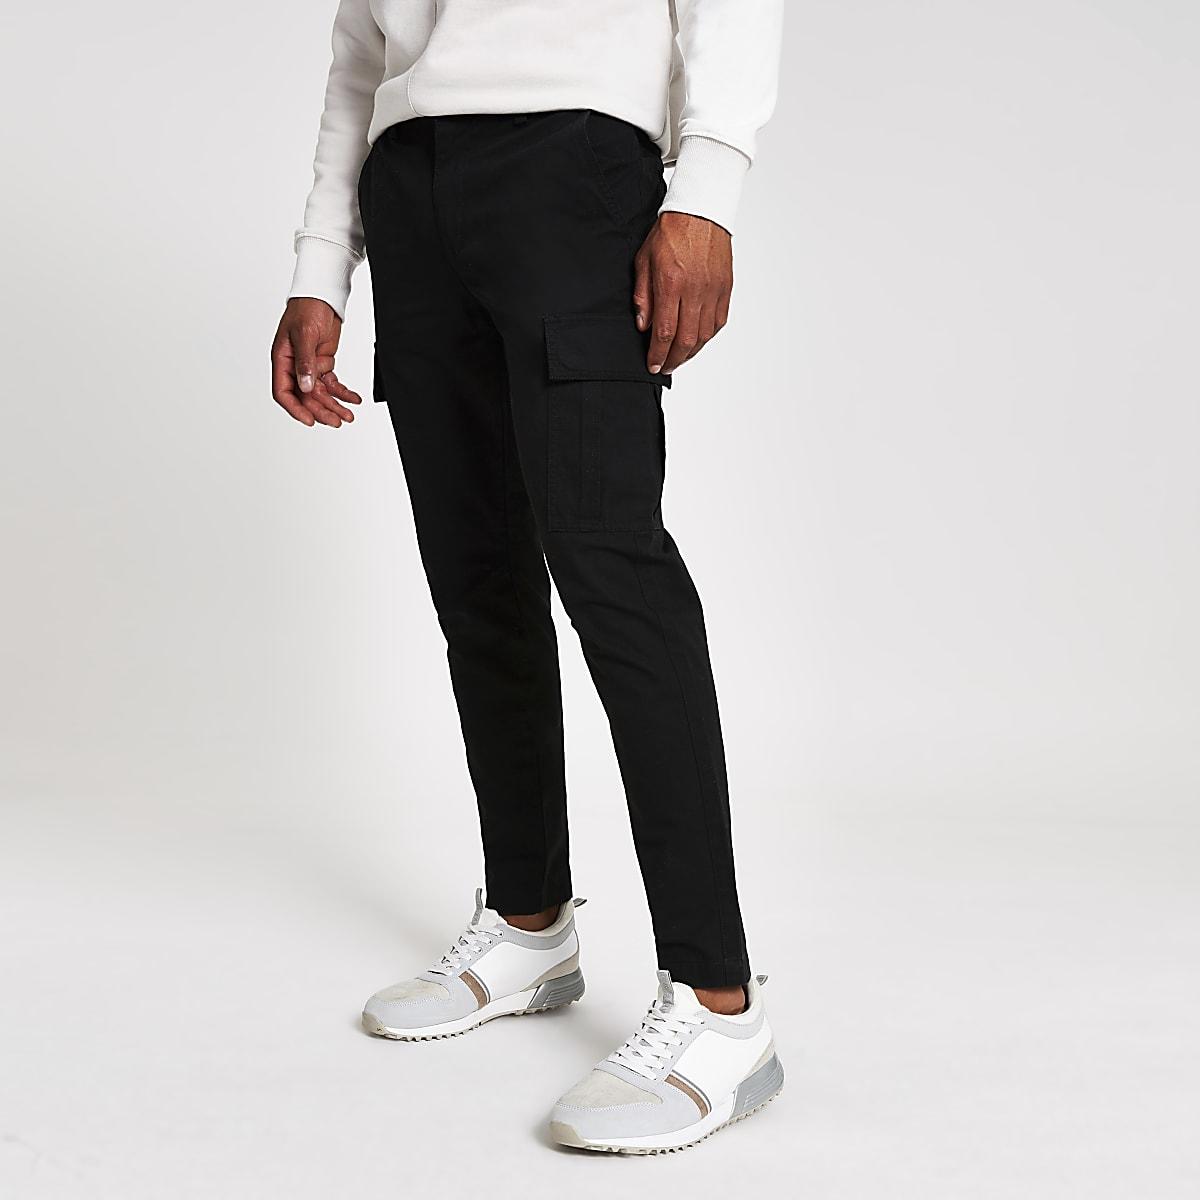 Schwarze Skinny Cargo-Hose